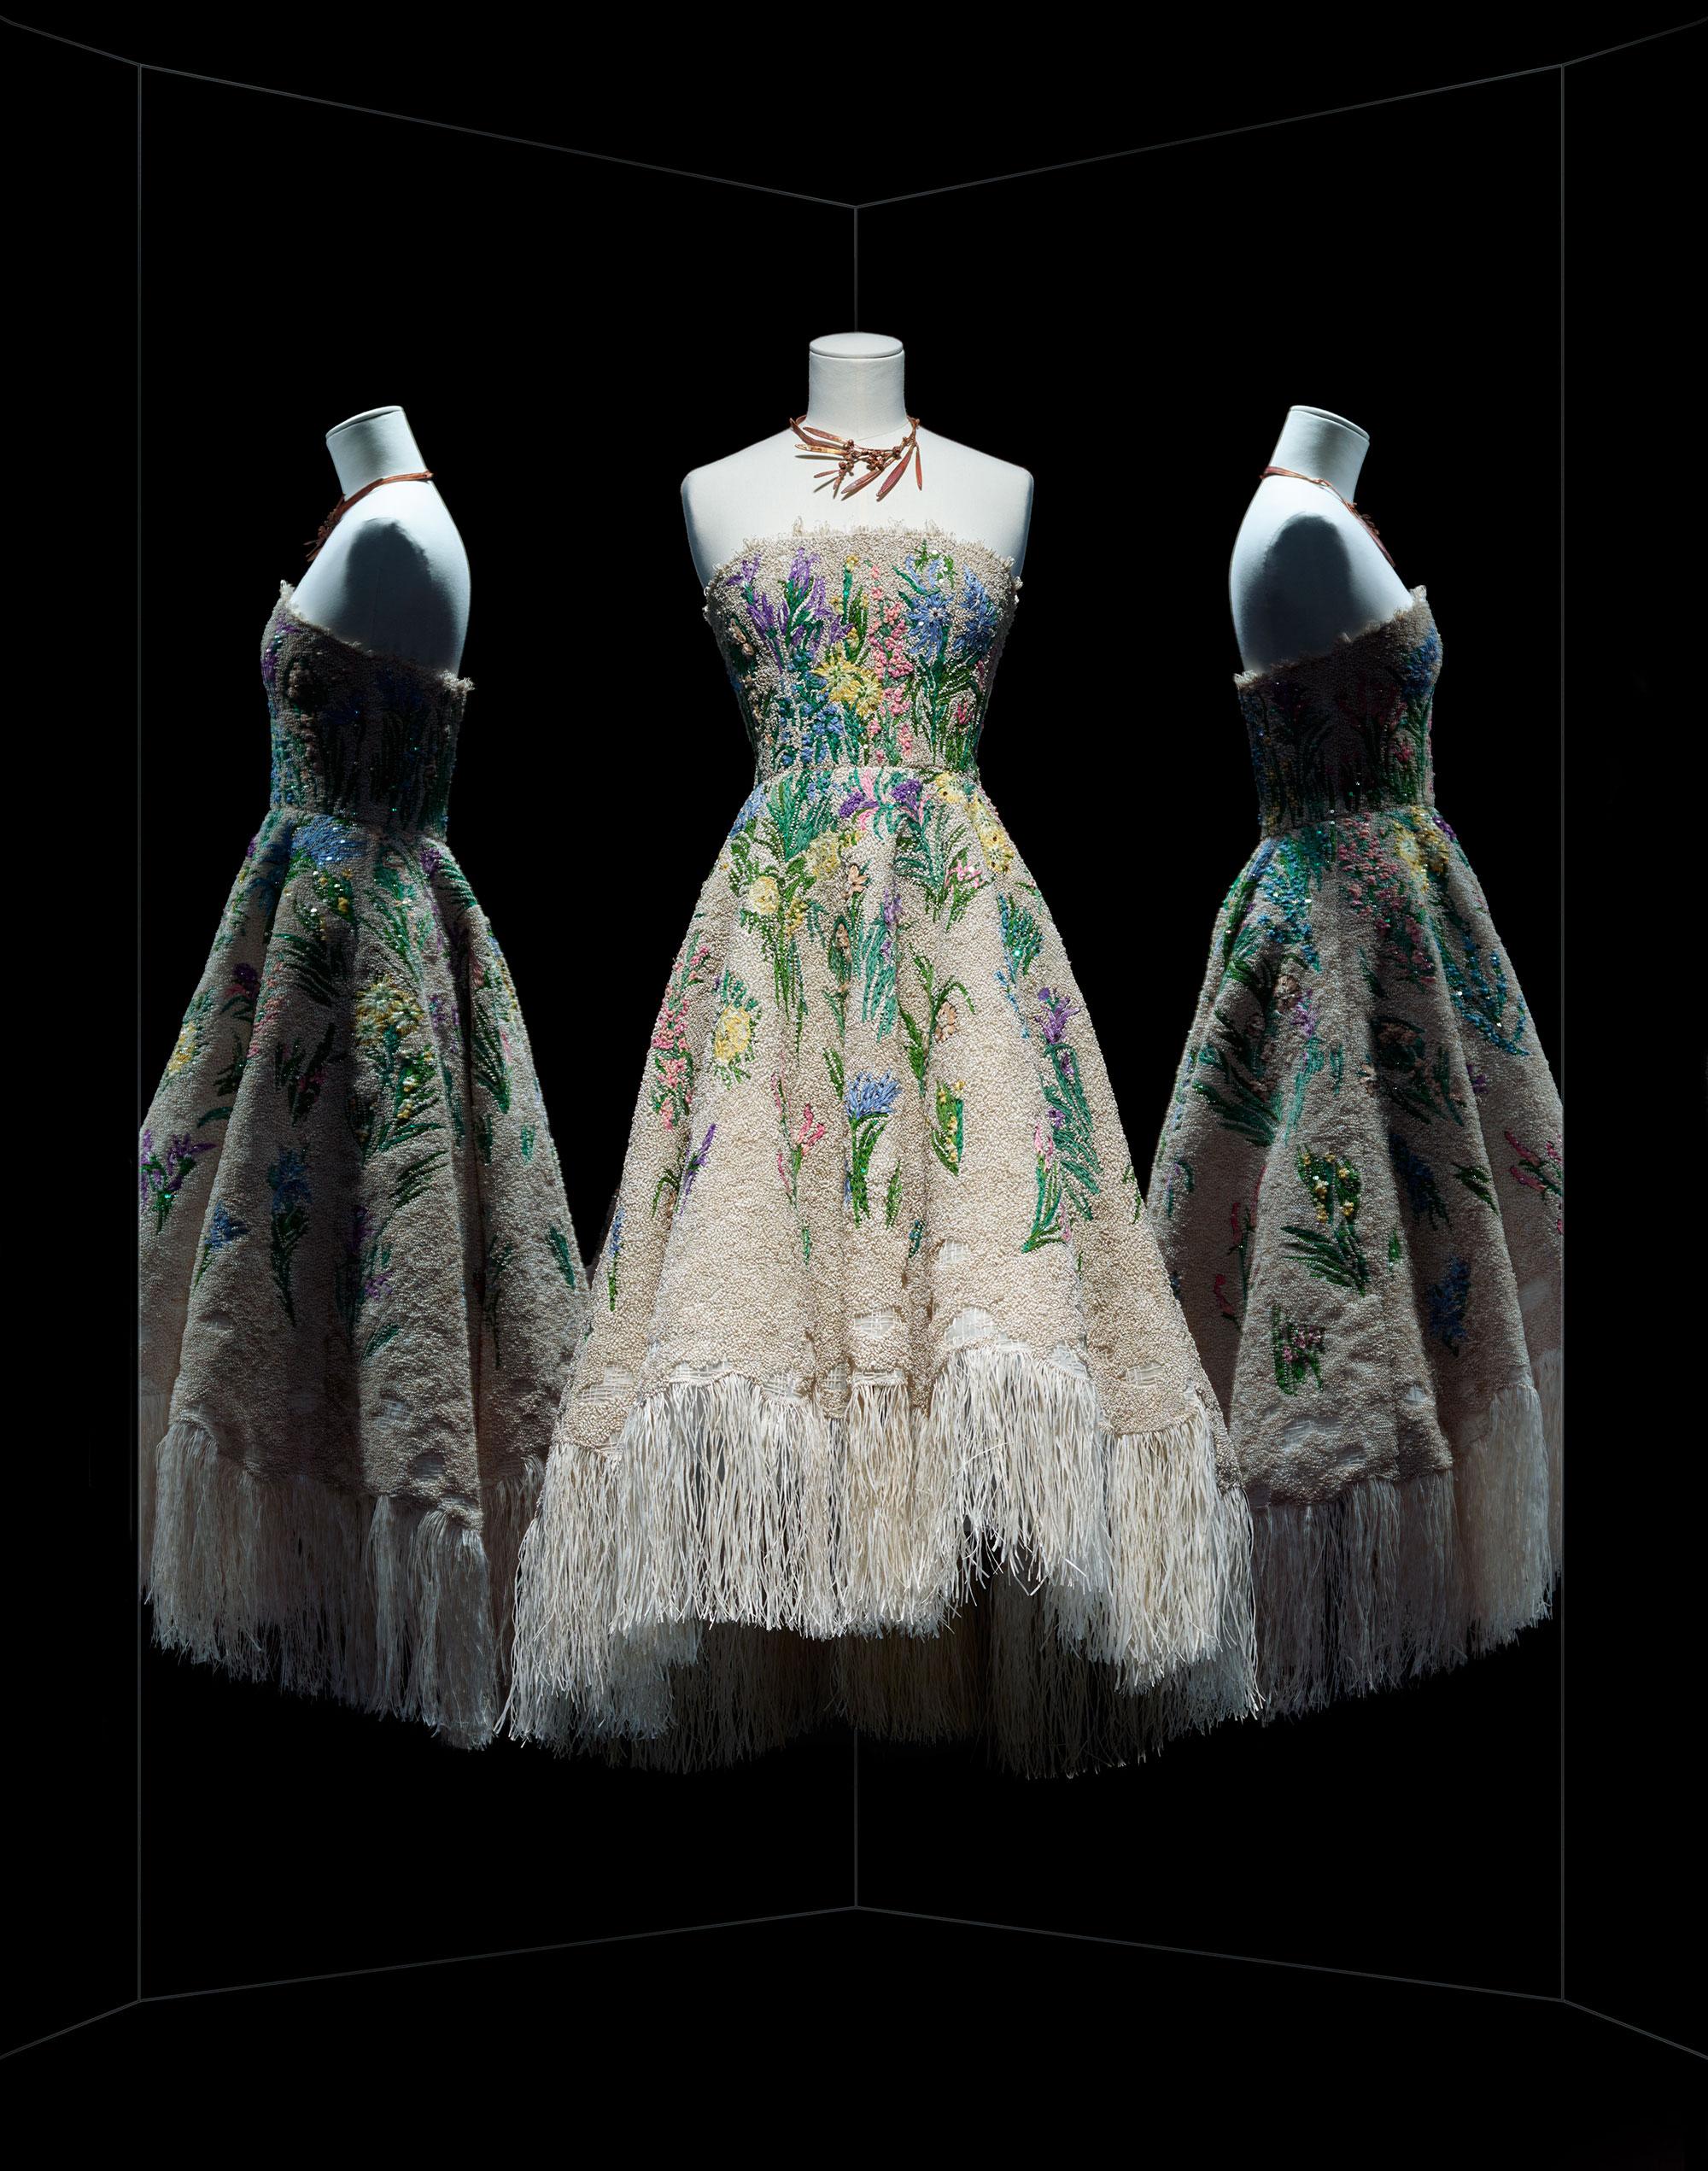 0c19c9cdc Maria Grazia Chiuri for Christian Dior, Essence d'herbier cocktail dress,  Haute Couture